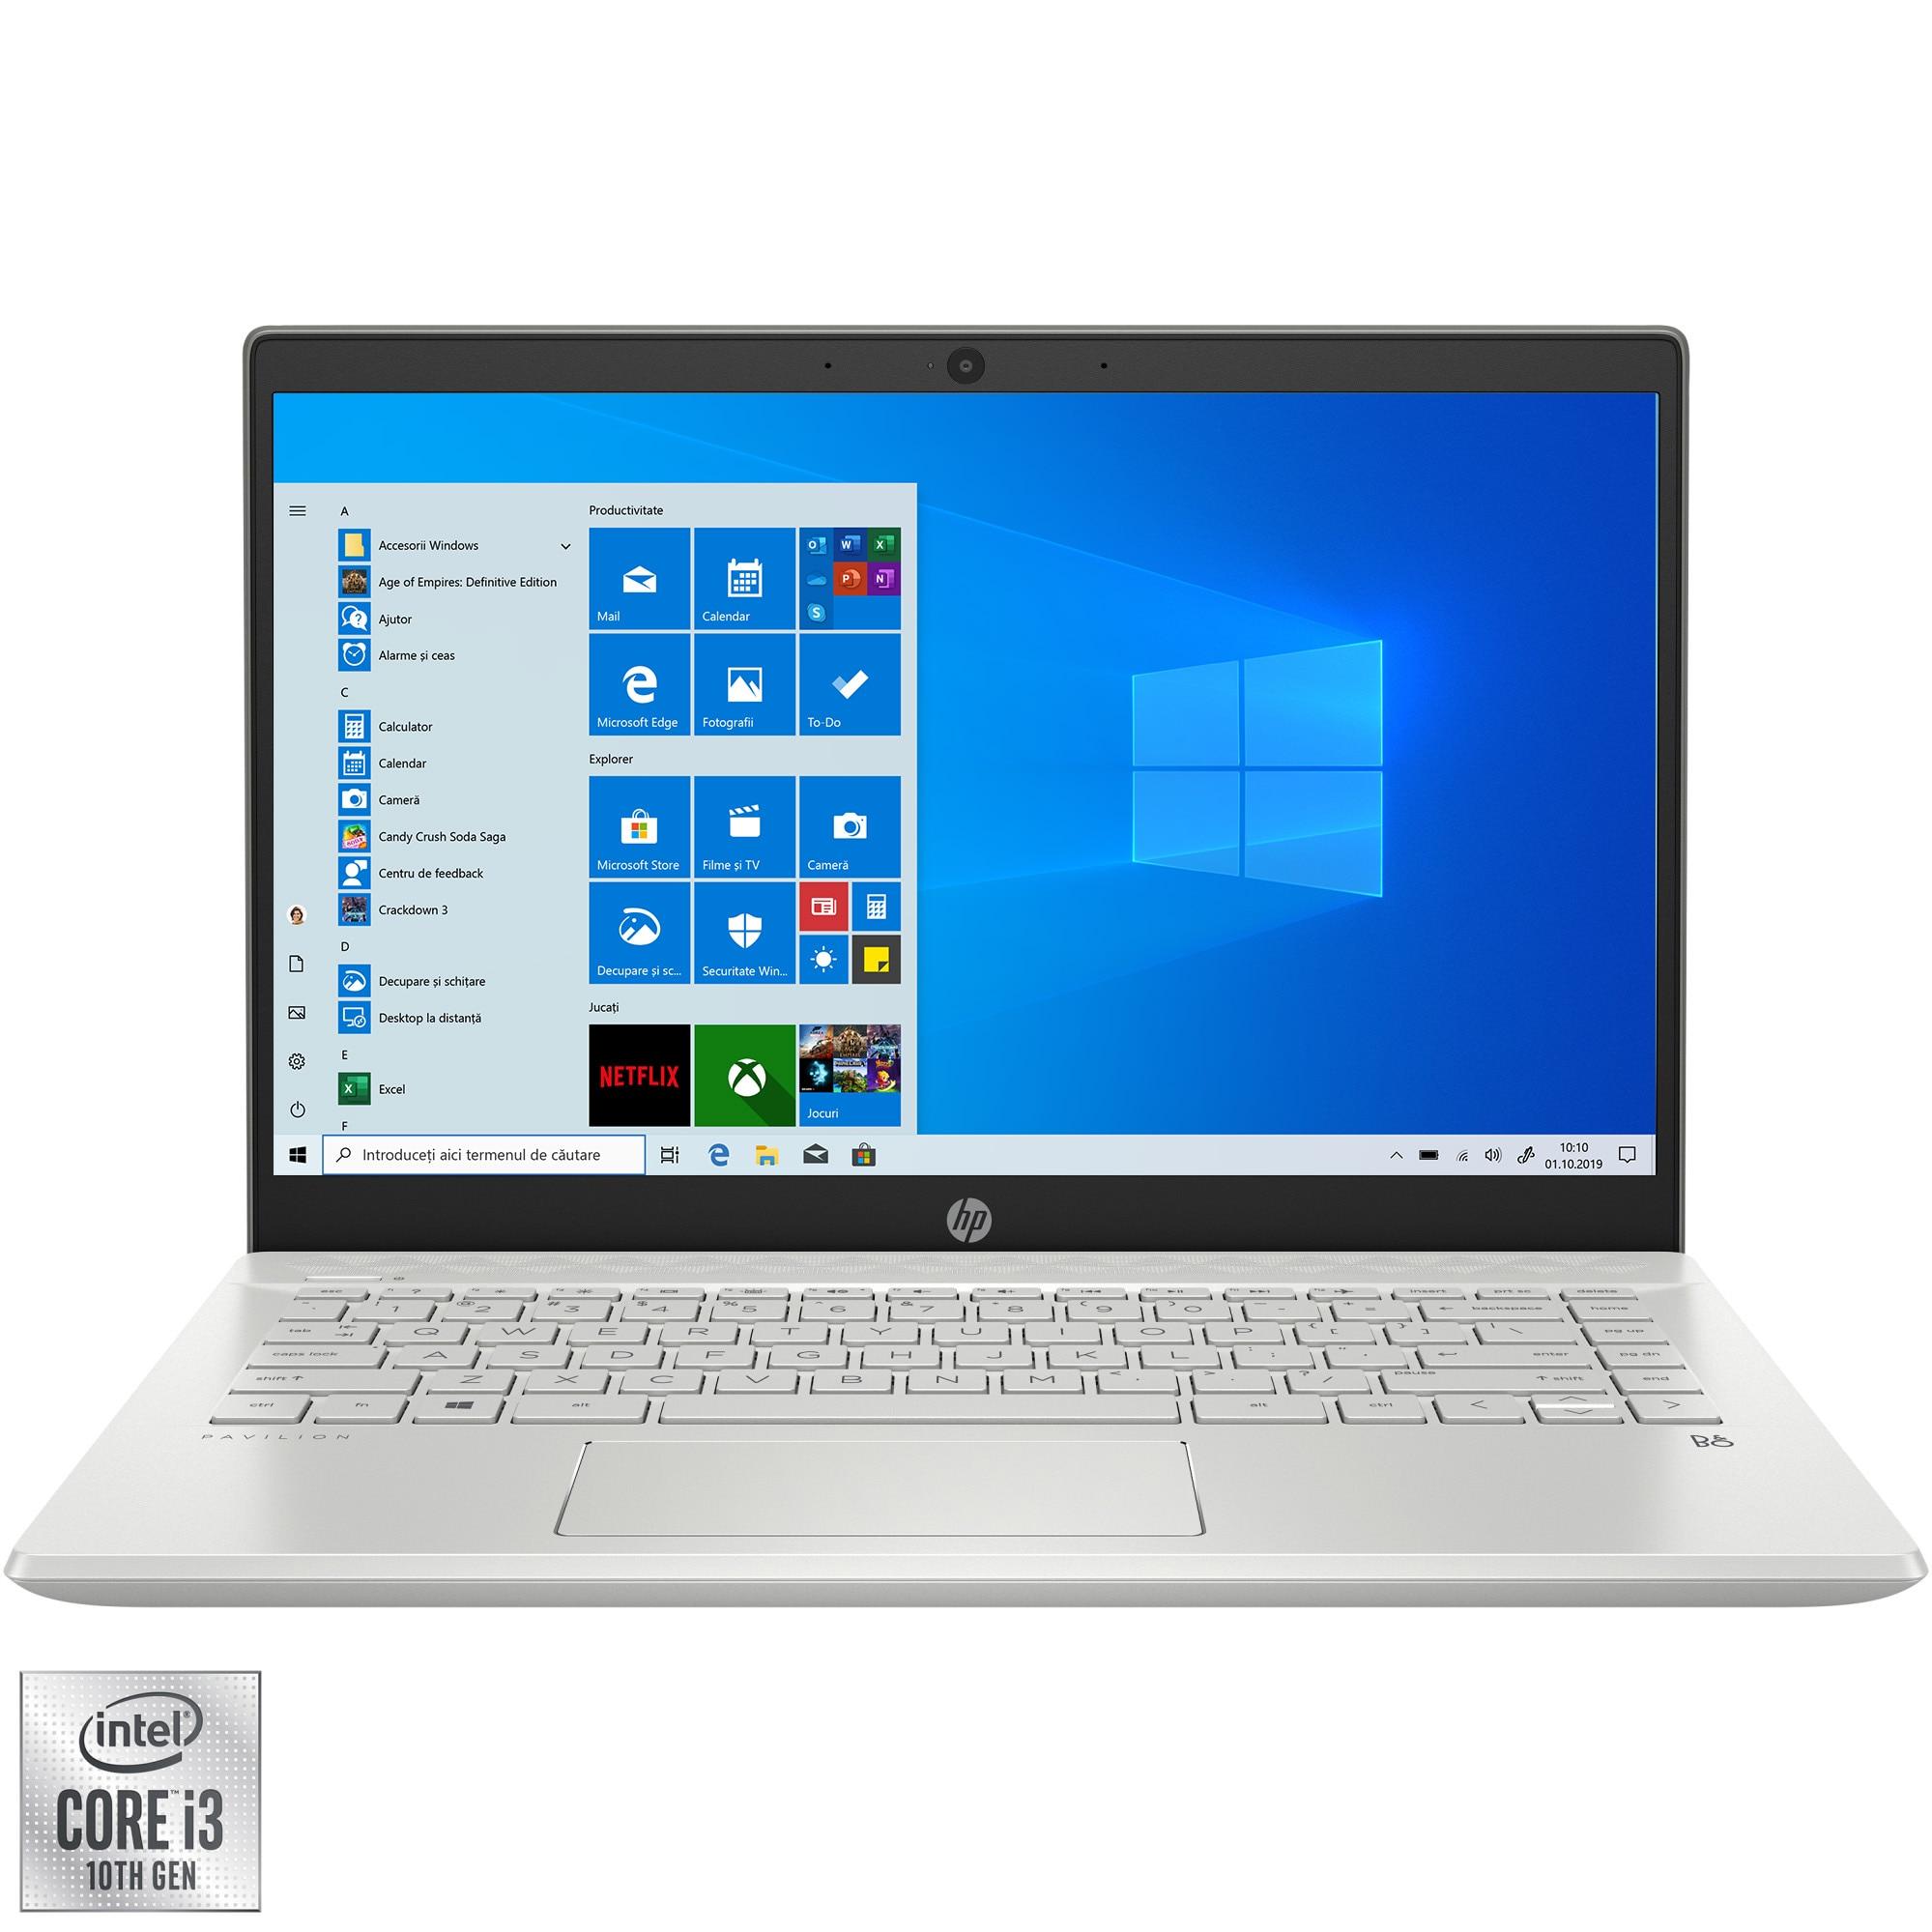 "Fotografie Laptop ultraportabil HP Pavilion 14-ce3001nq cu procesor Intel® Core™ i3-1005G1 pana la 3.40 GHz Ice Lake, 14"", HD, 4GB, 256GB SSD, Intel UHD Graphics, Windows 10 Home, Mineral Silver"